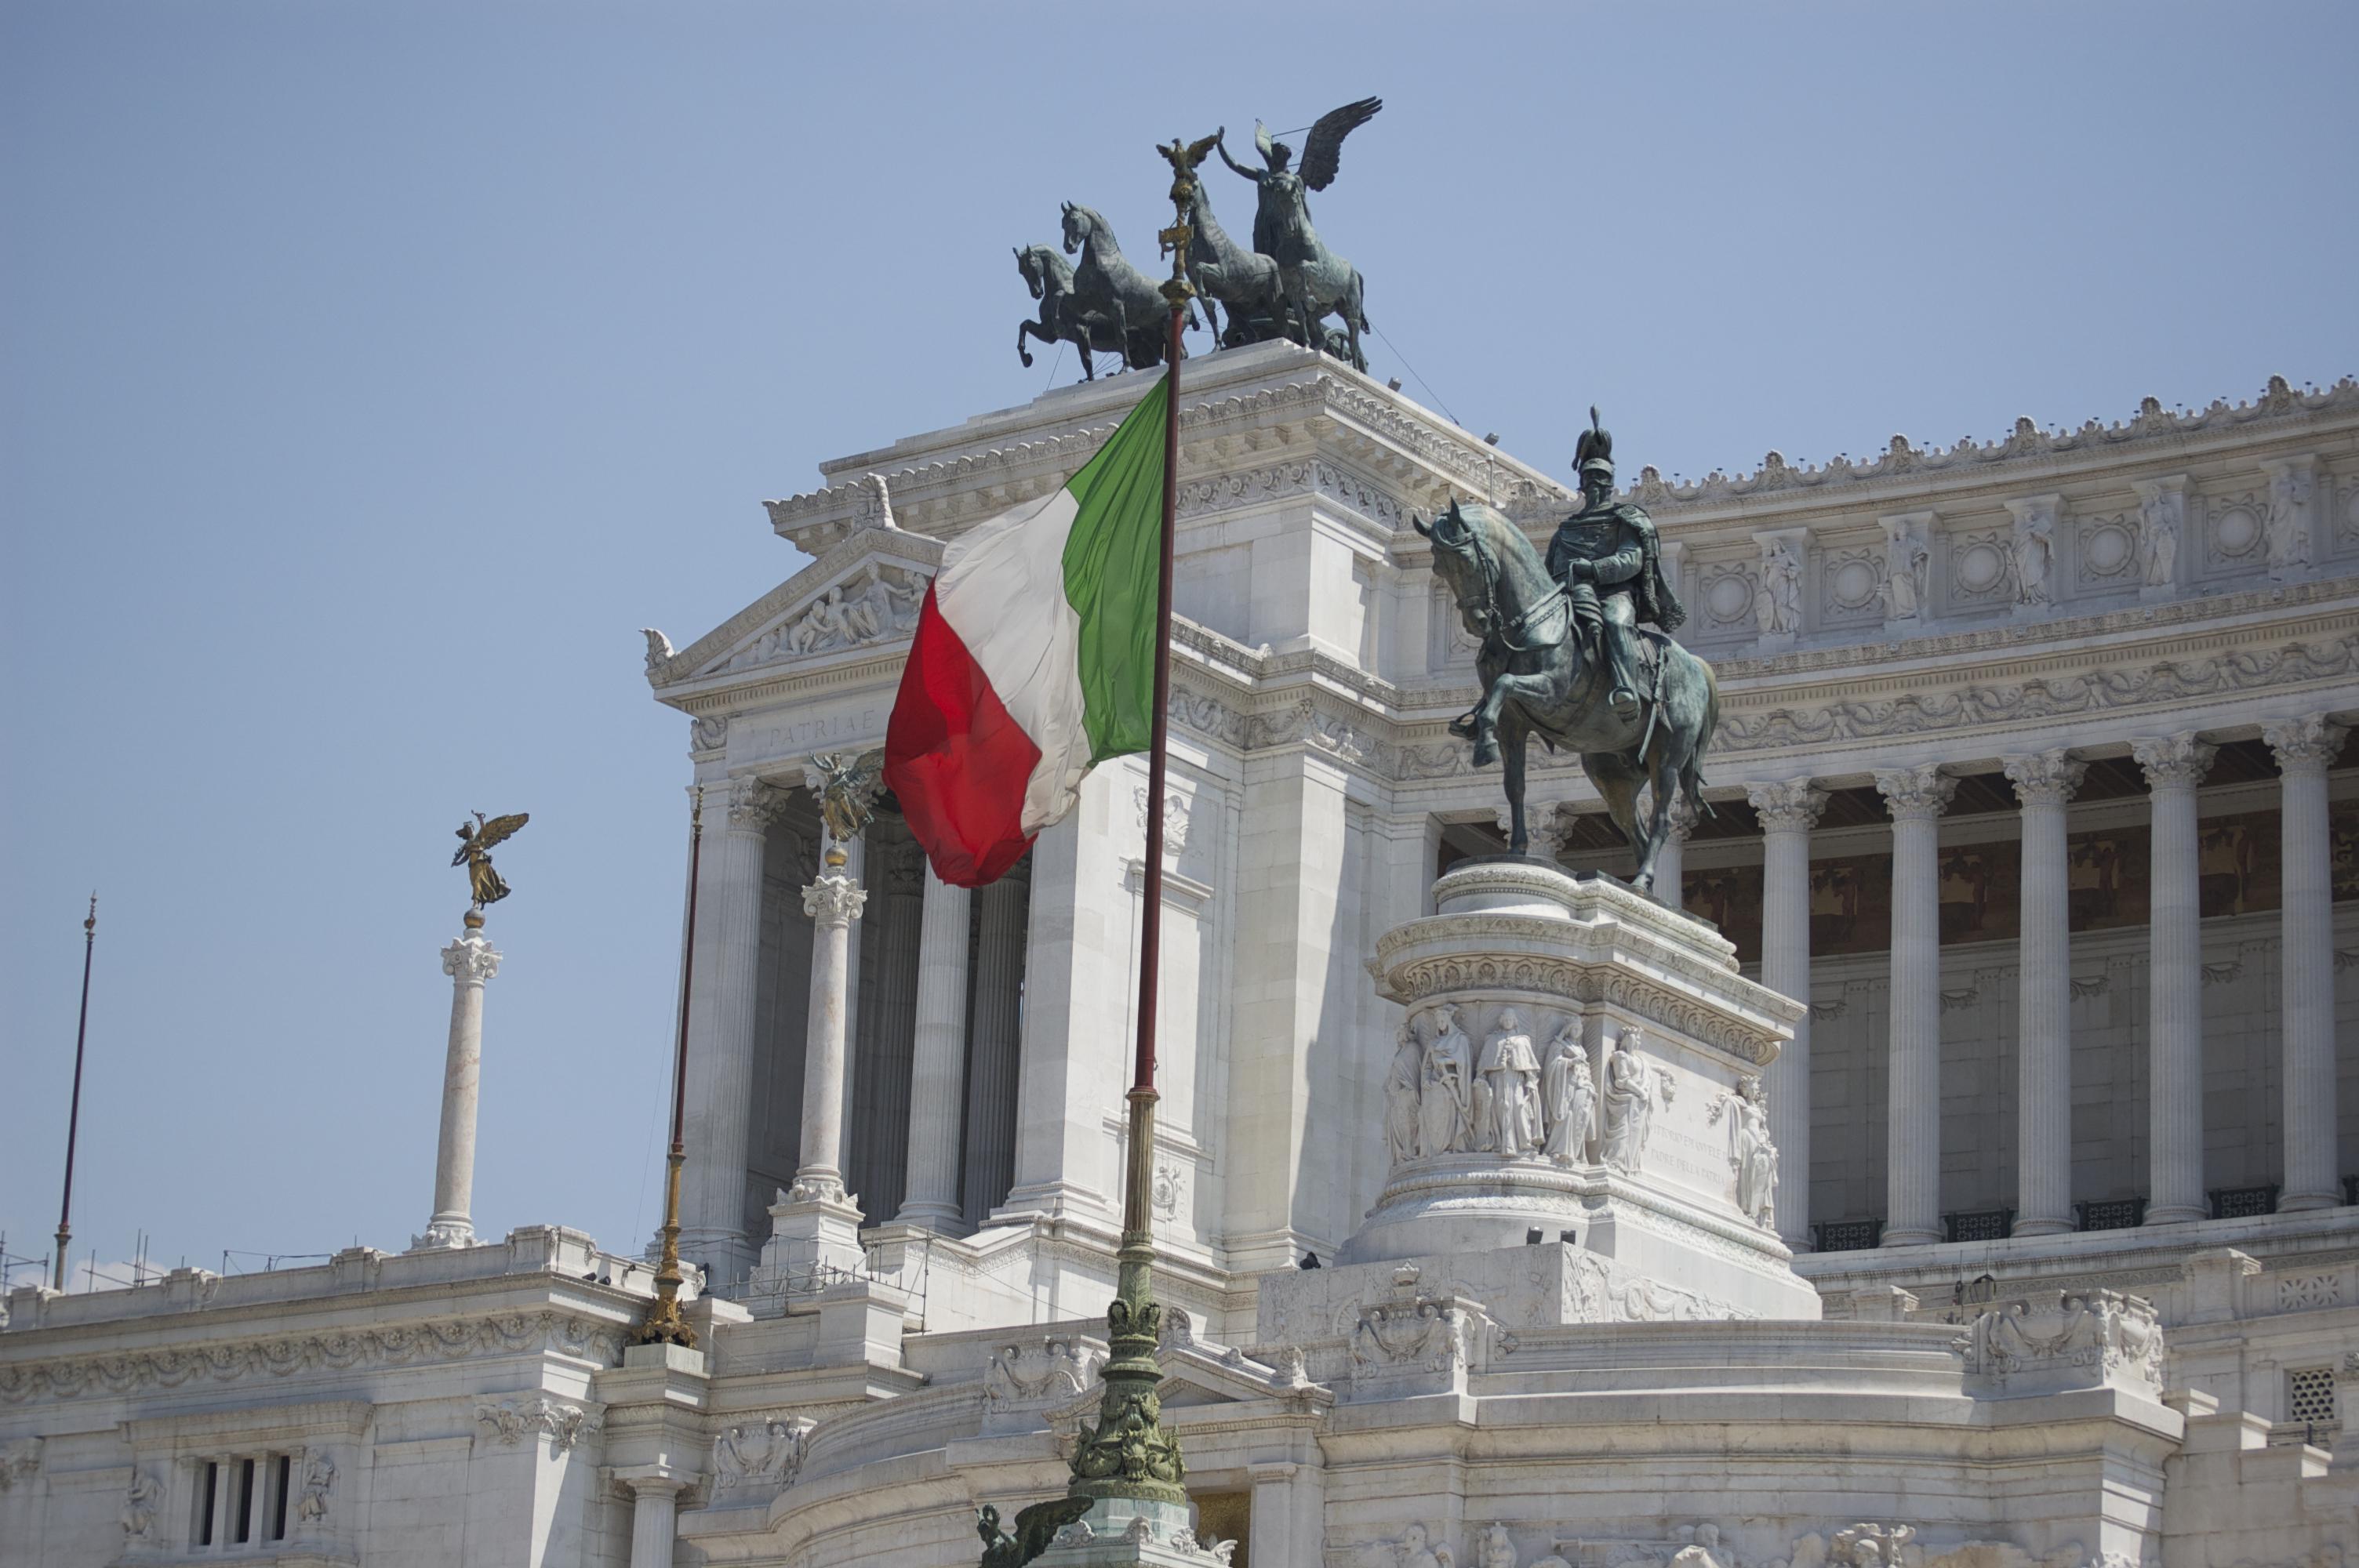 Monument Van Victor Emanuel Ii.File Monument Van Victor Emanuel Ii Dsc 0234 Jpg Wikimedia